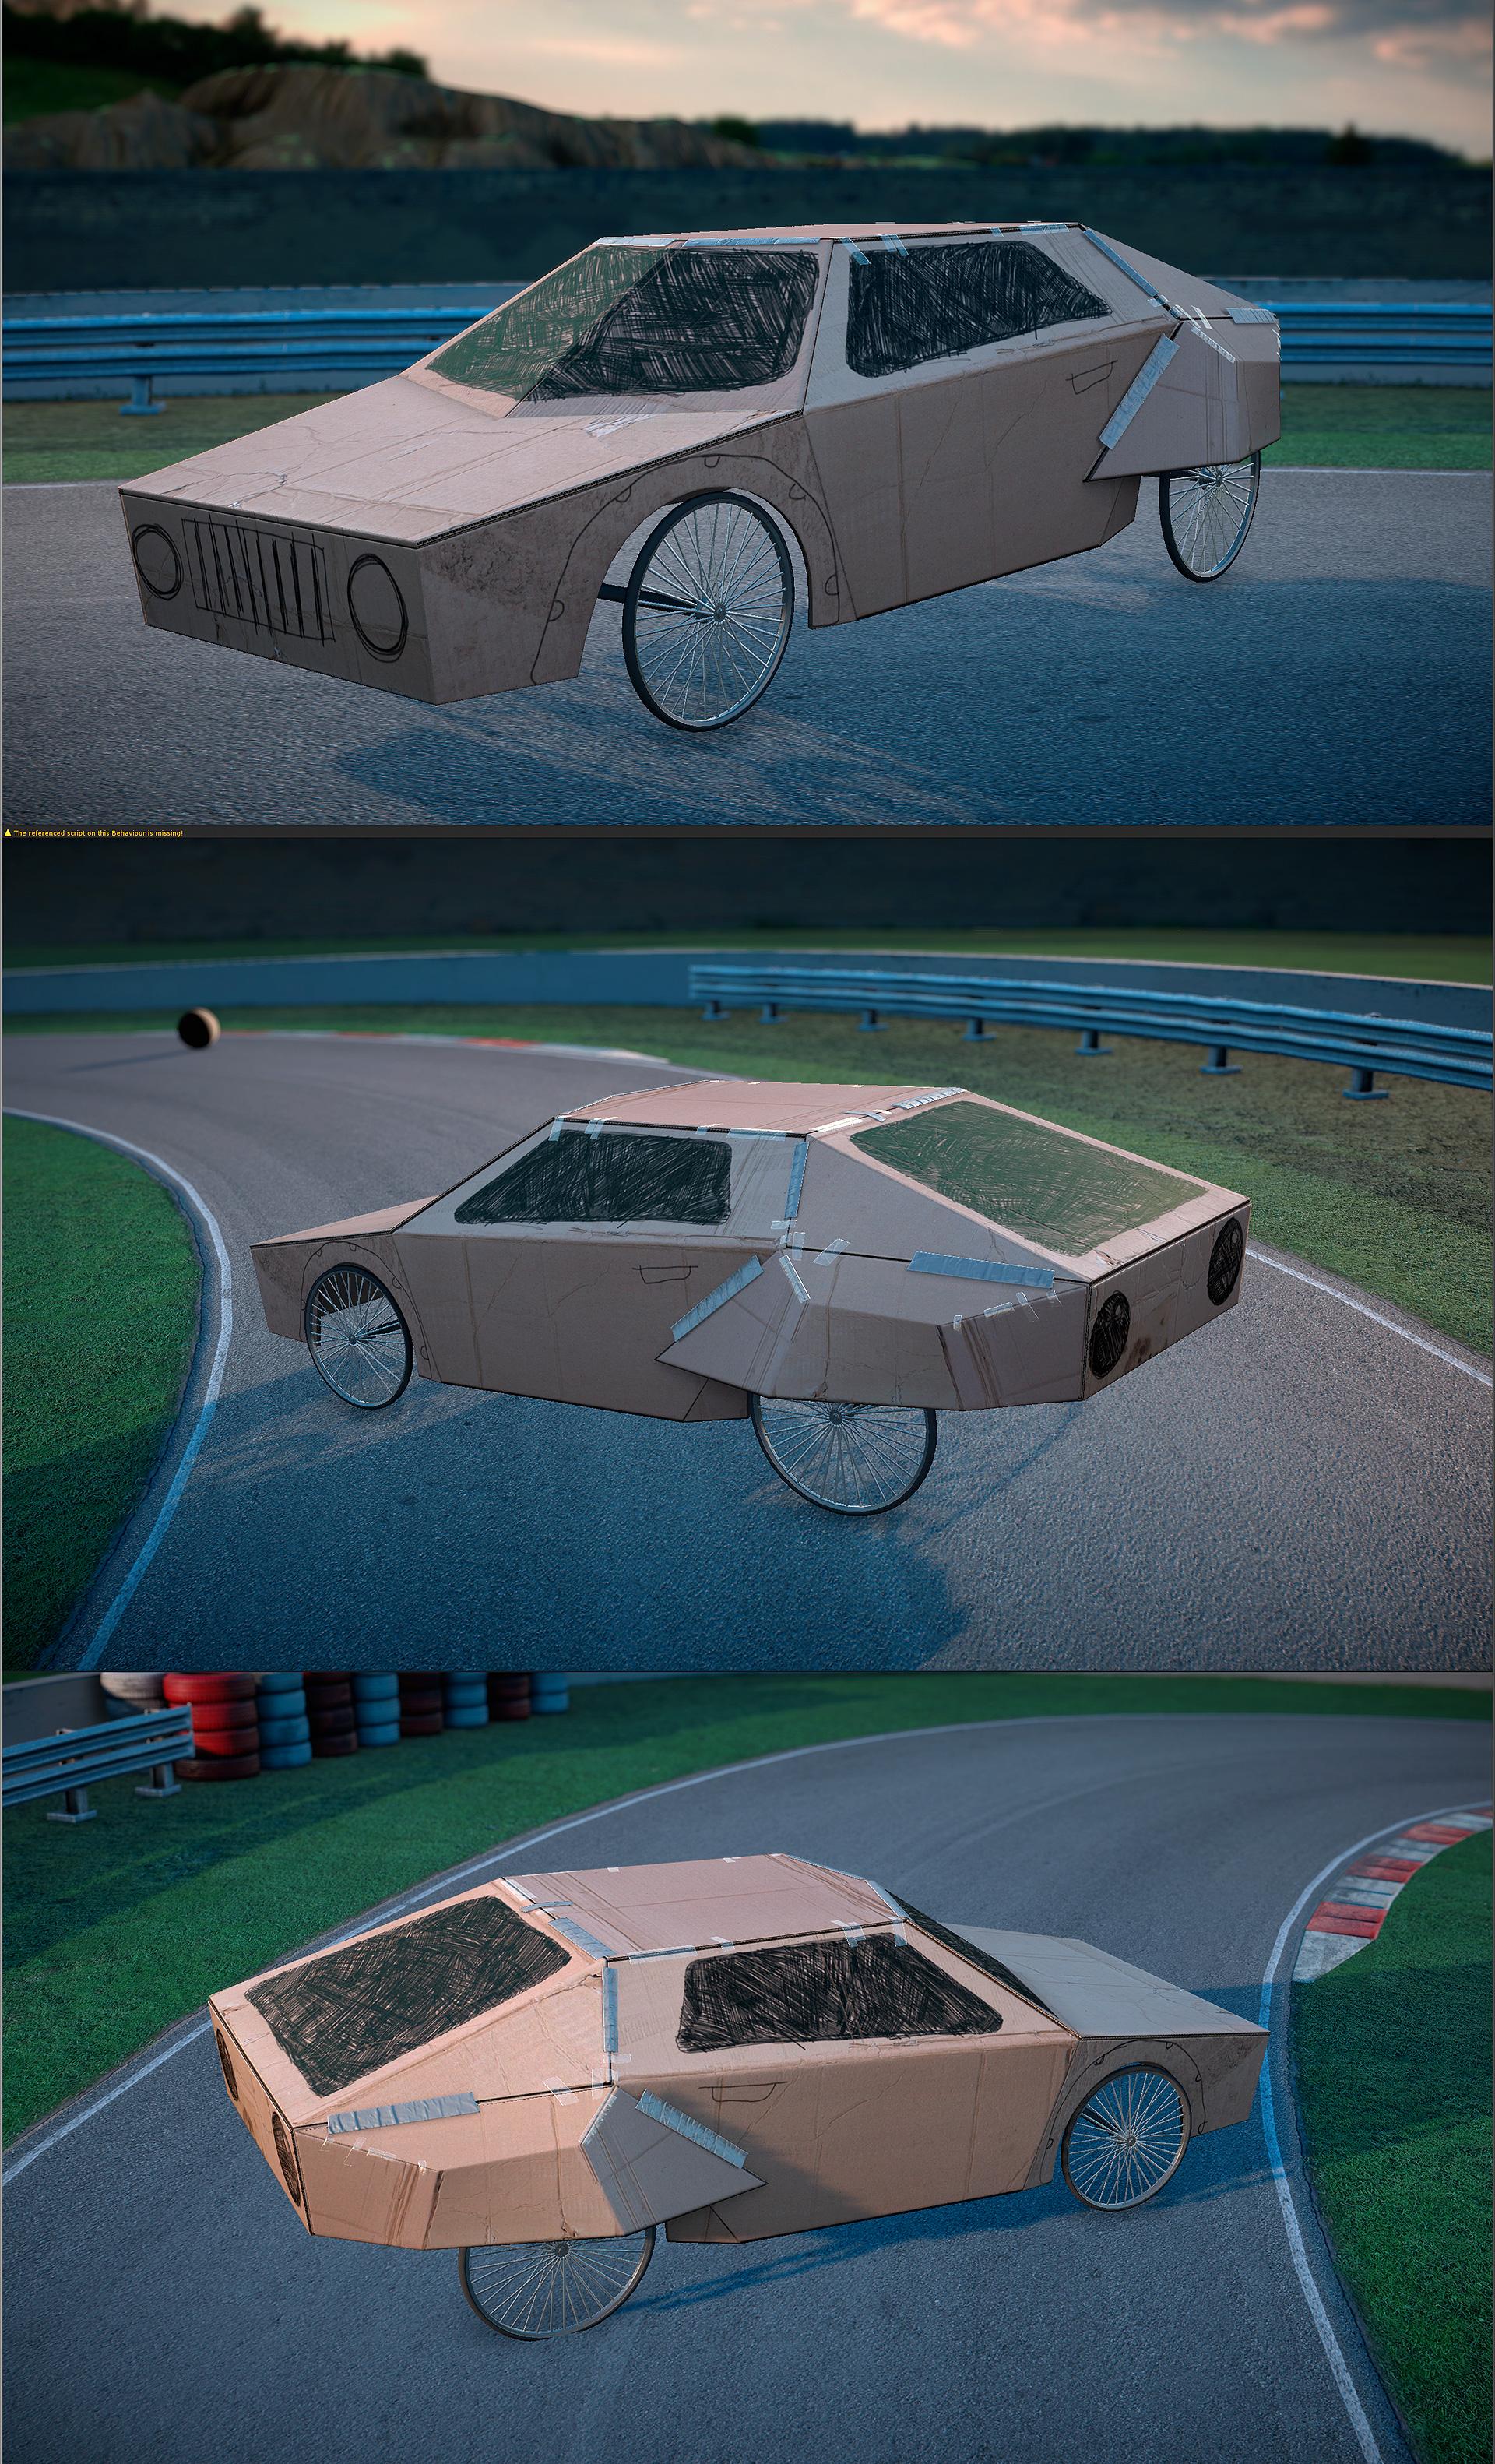 cardboard_car.jpg